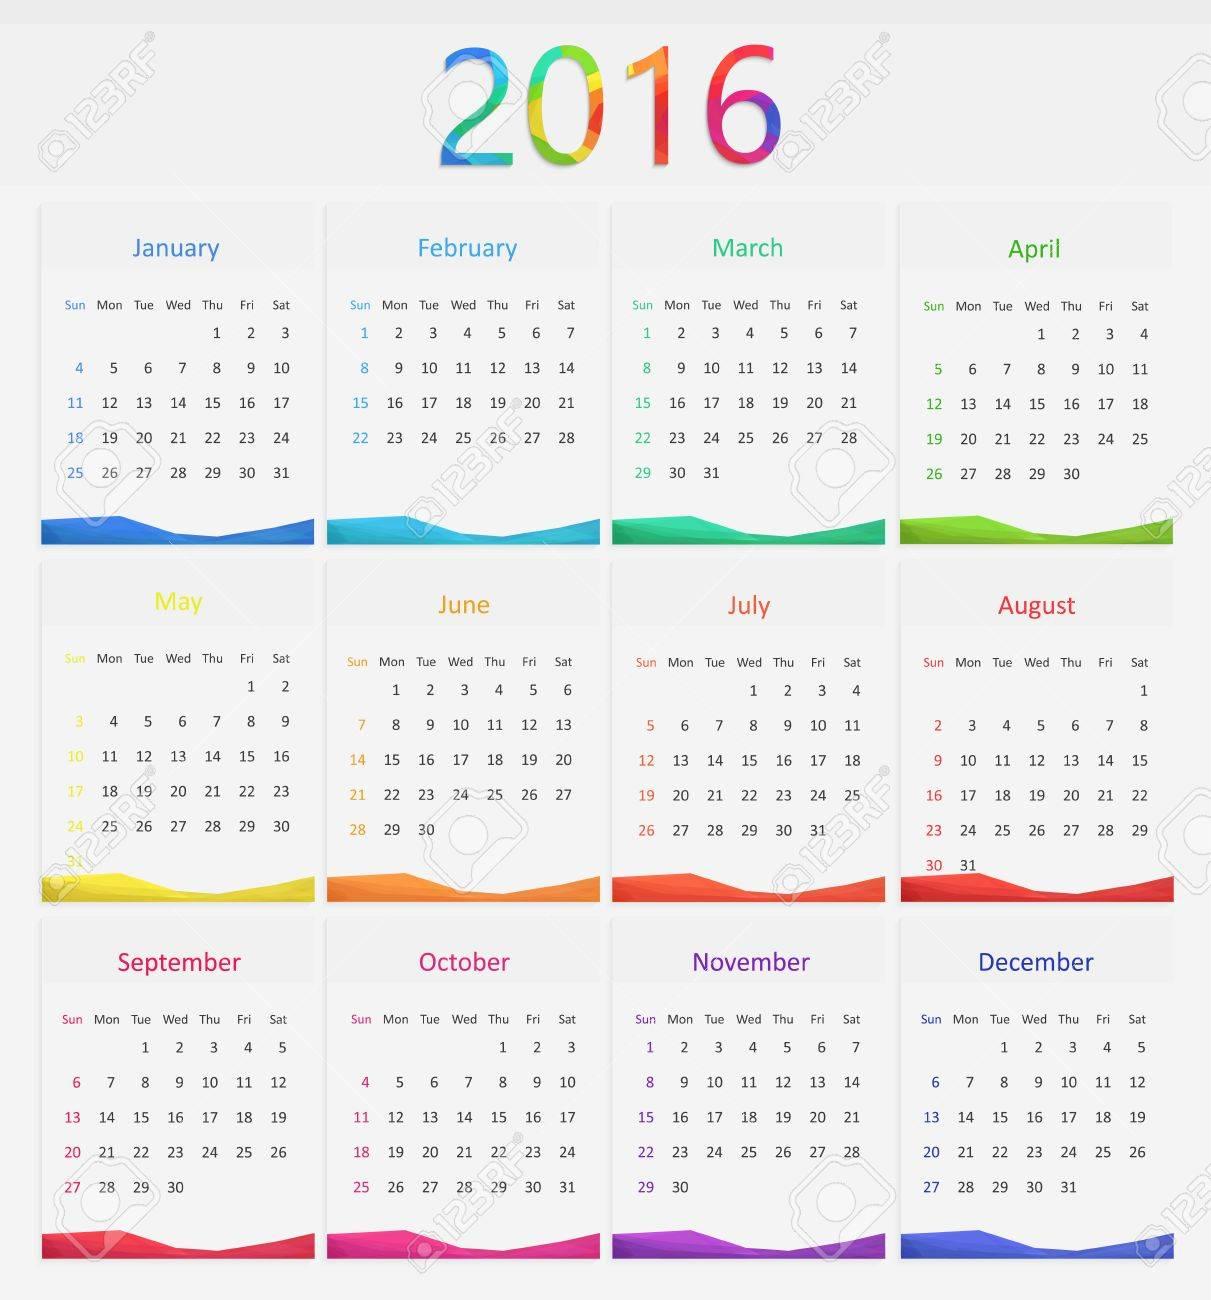 2016 Calendar Illustration. New Year Days